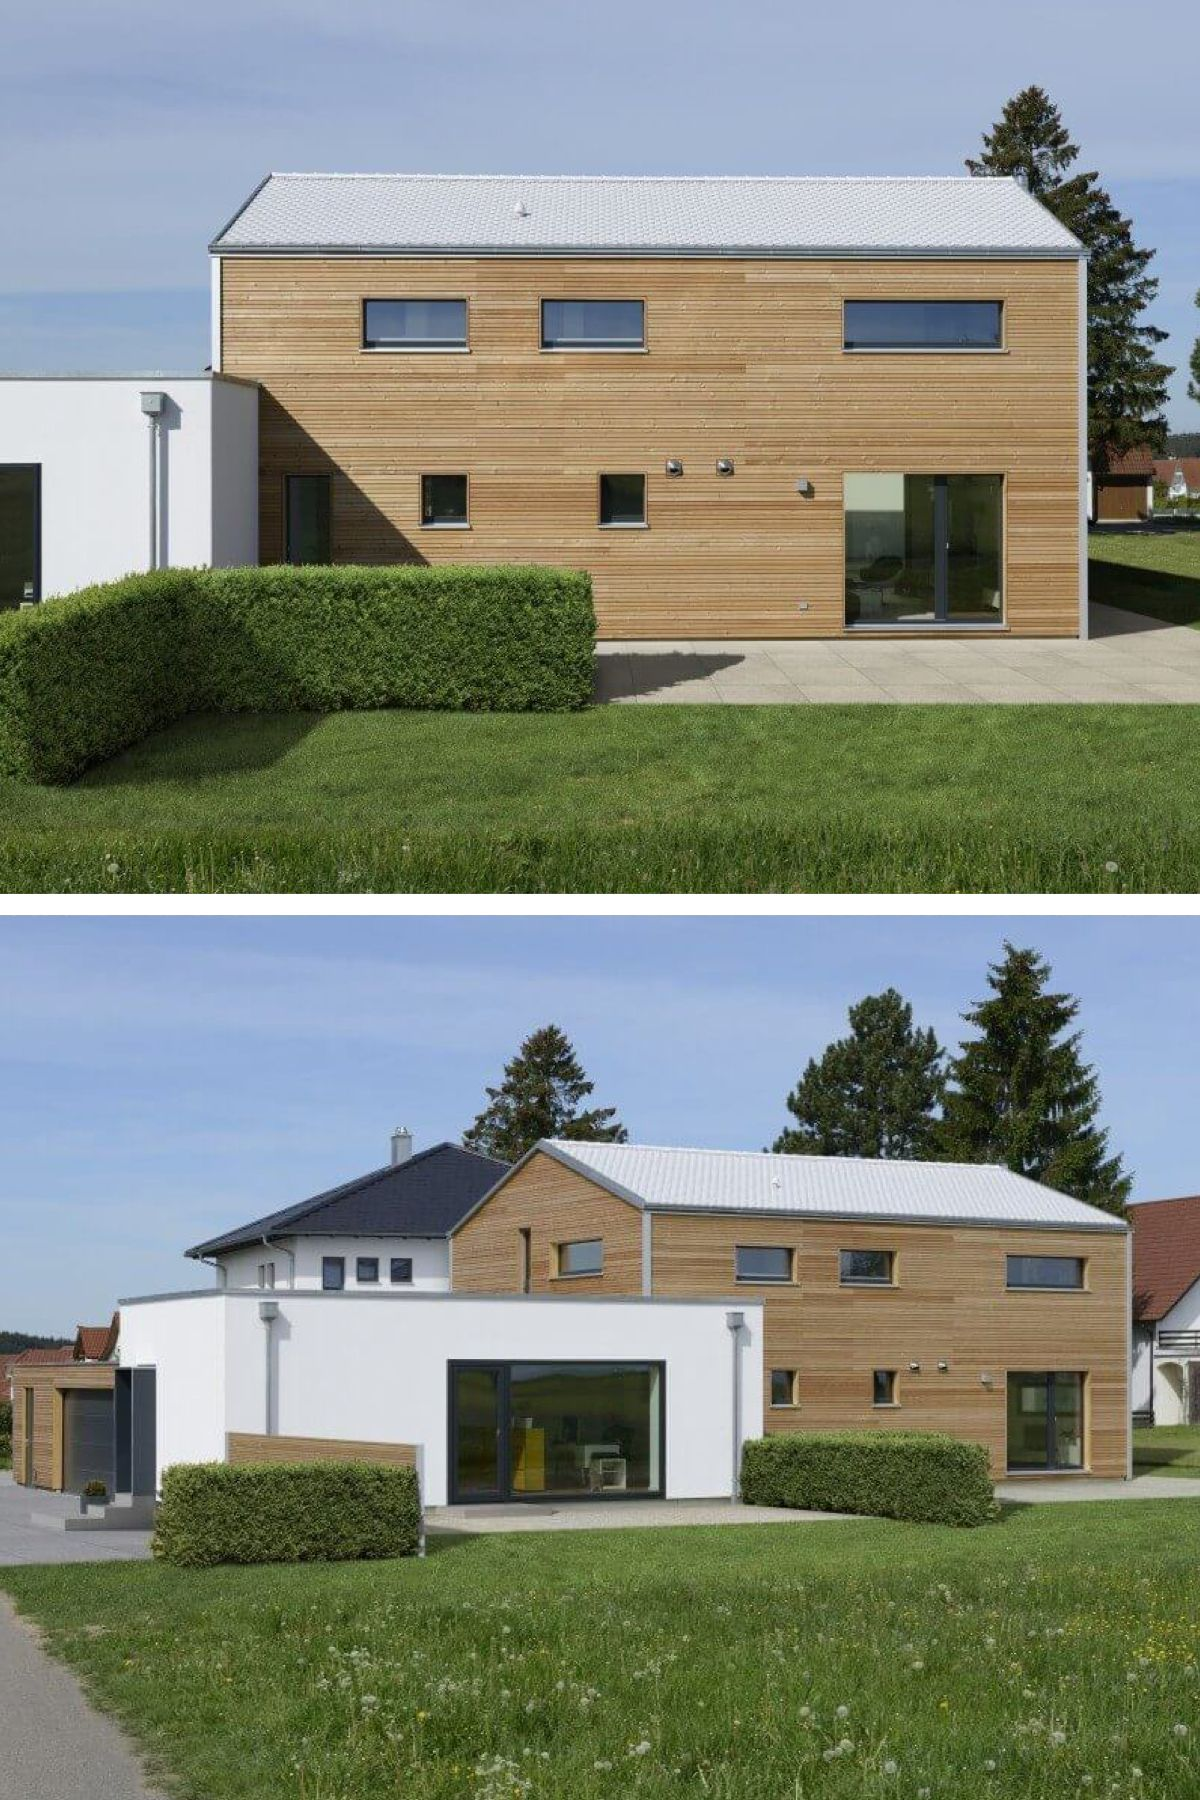 moderner bungalow baufritz haus eingang holzfassade. Black Bedroom Furniture Sets. Home Design Ideas